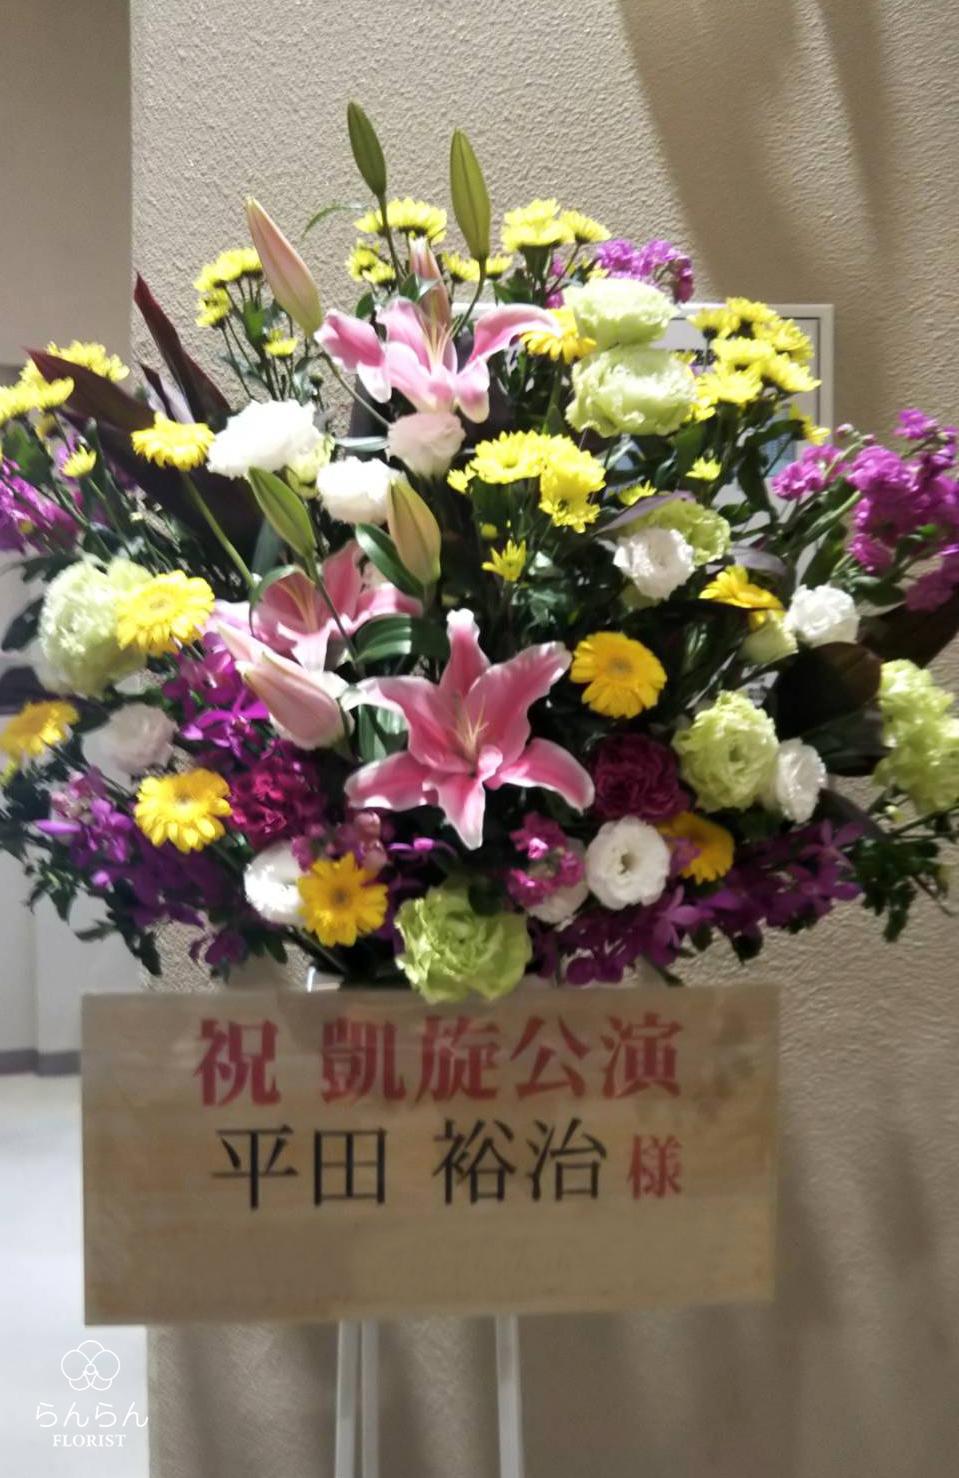 北区 AKT STAGE 福岡凱旋特別公演「熱海殺人事件」出演者 お祝いスタンド花